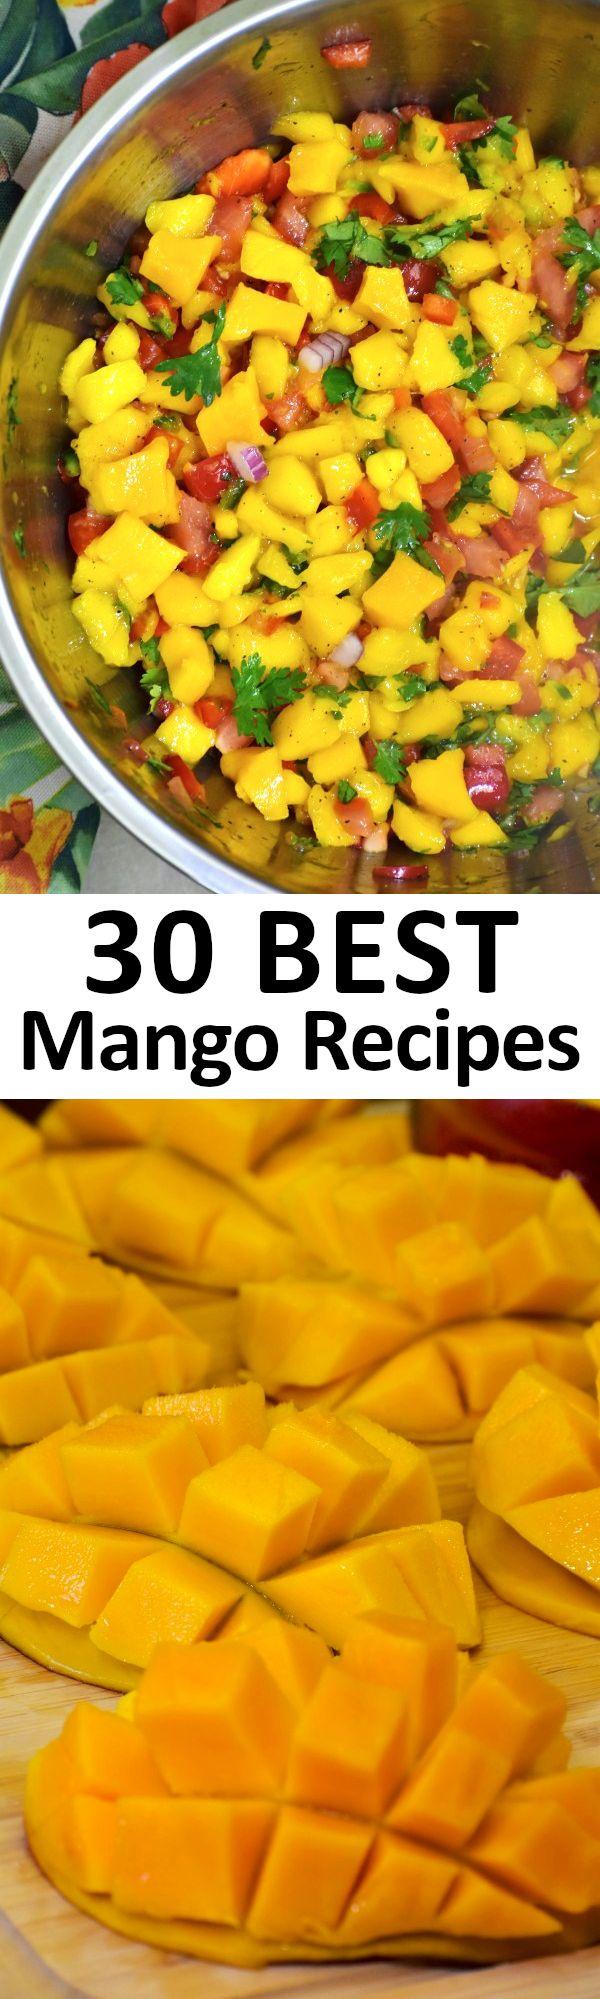 30 BEST Mango Recipes.